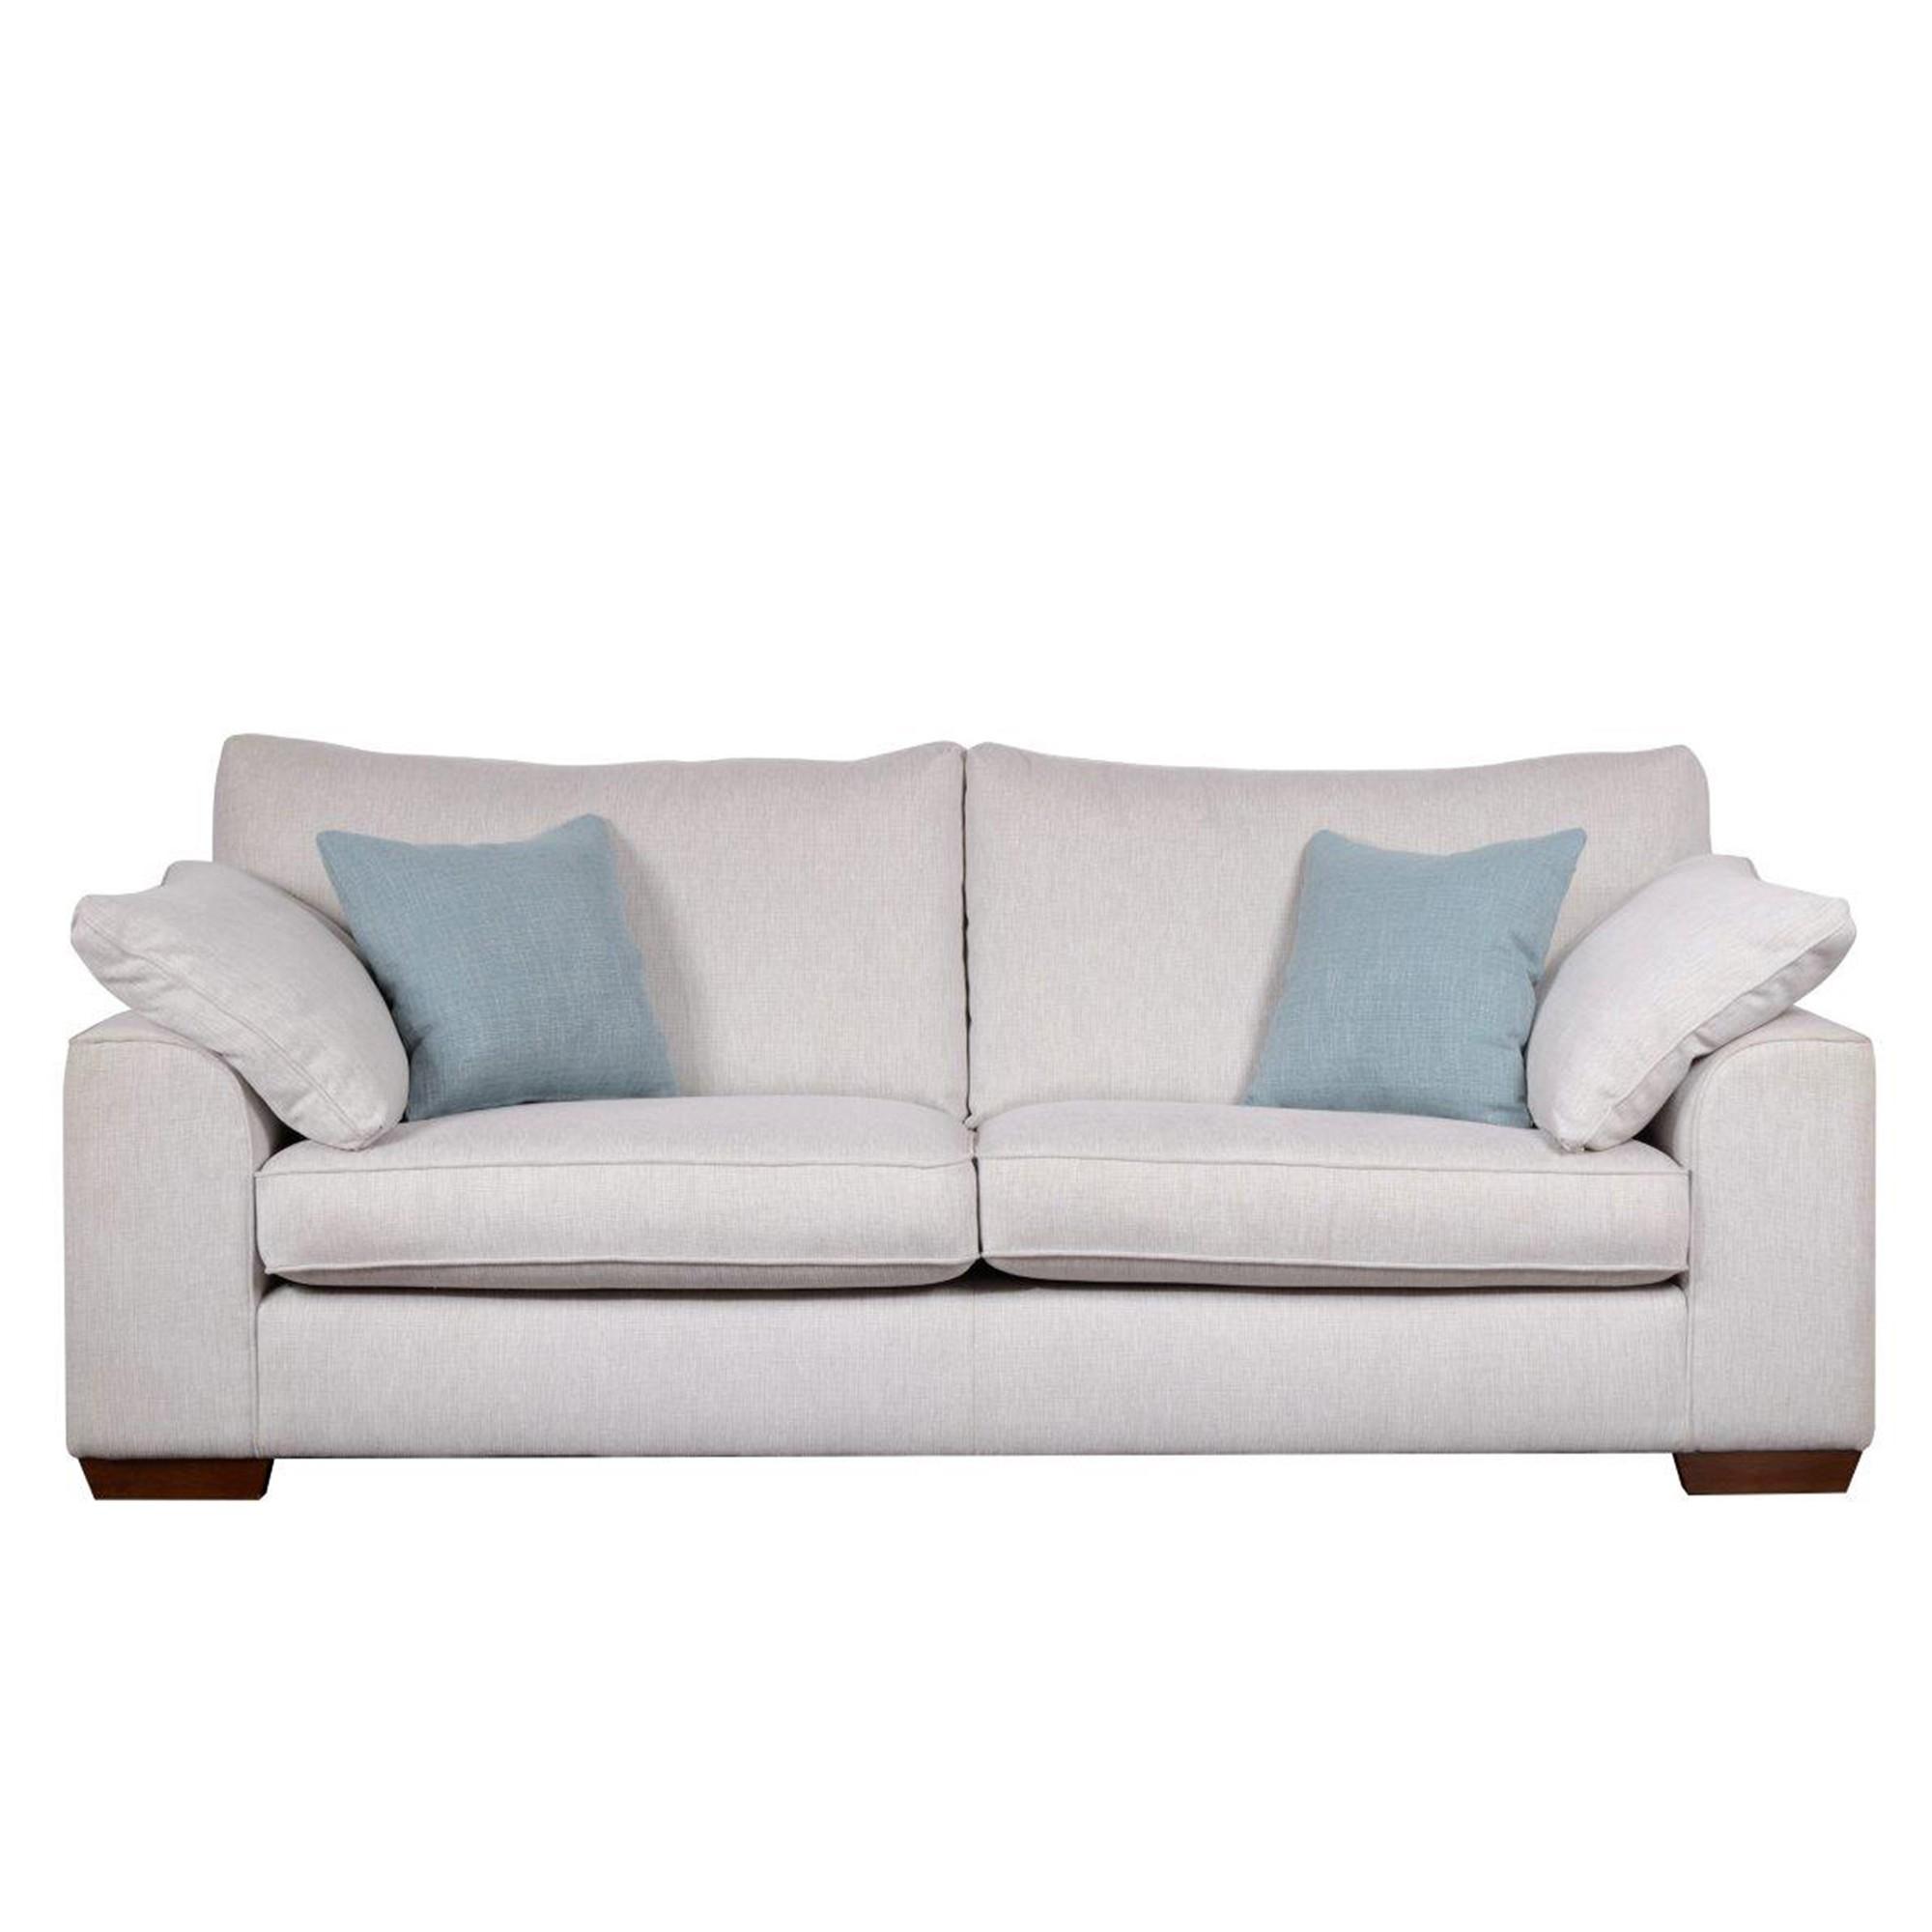 Michigan Sofa Fabric Sofas Cookes Furniture